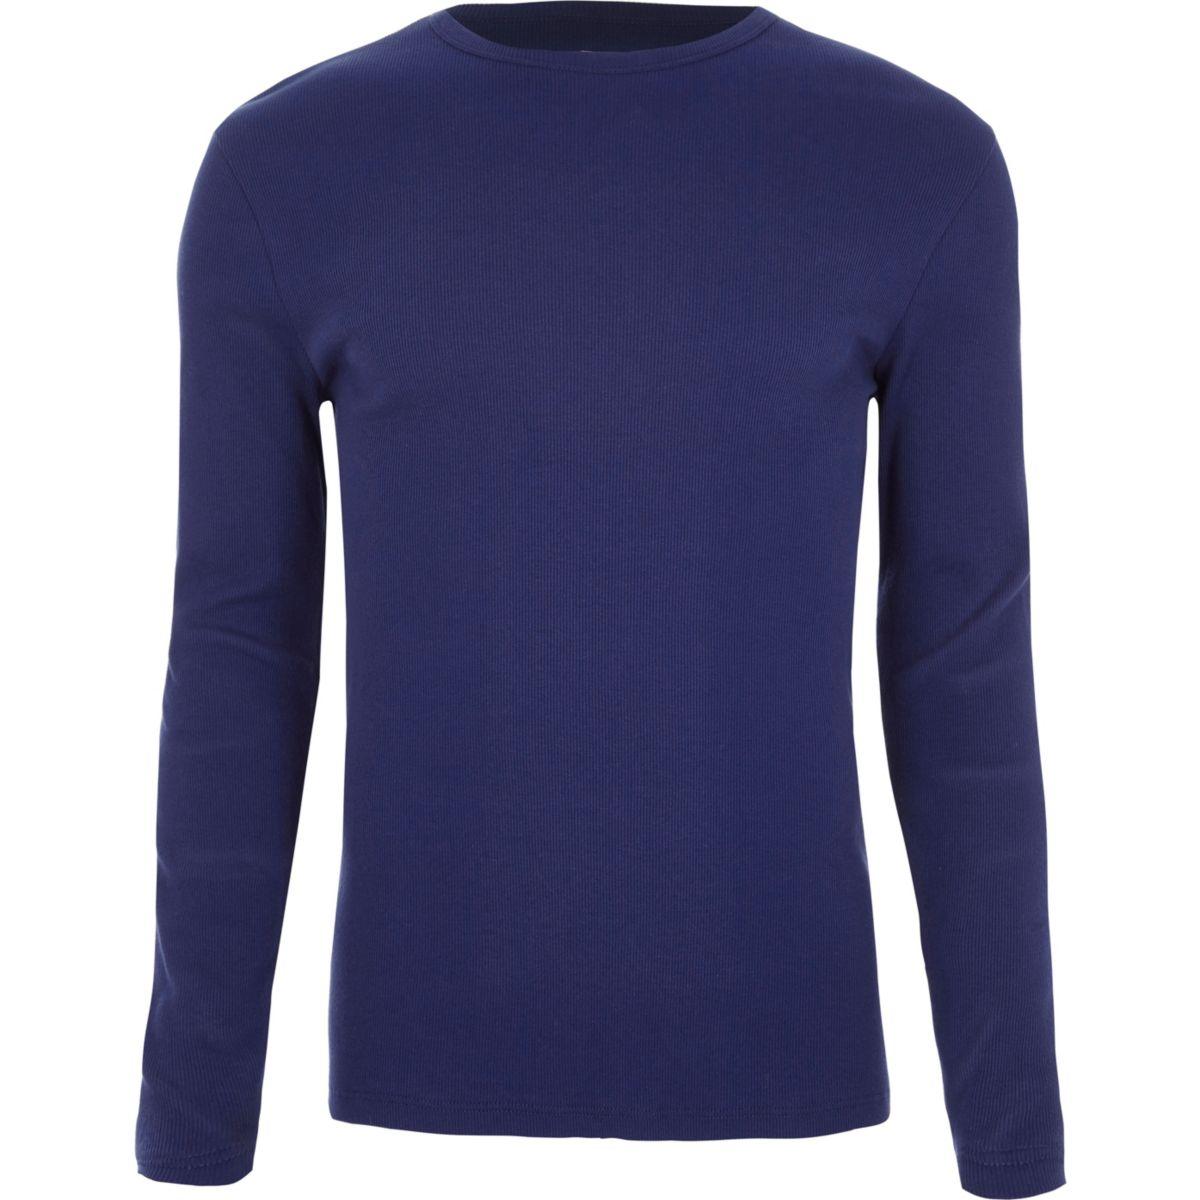 Blauw geribbeld slim-fit T-shirt met lange mouwen